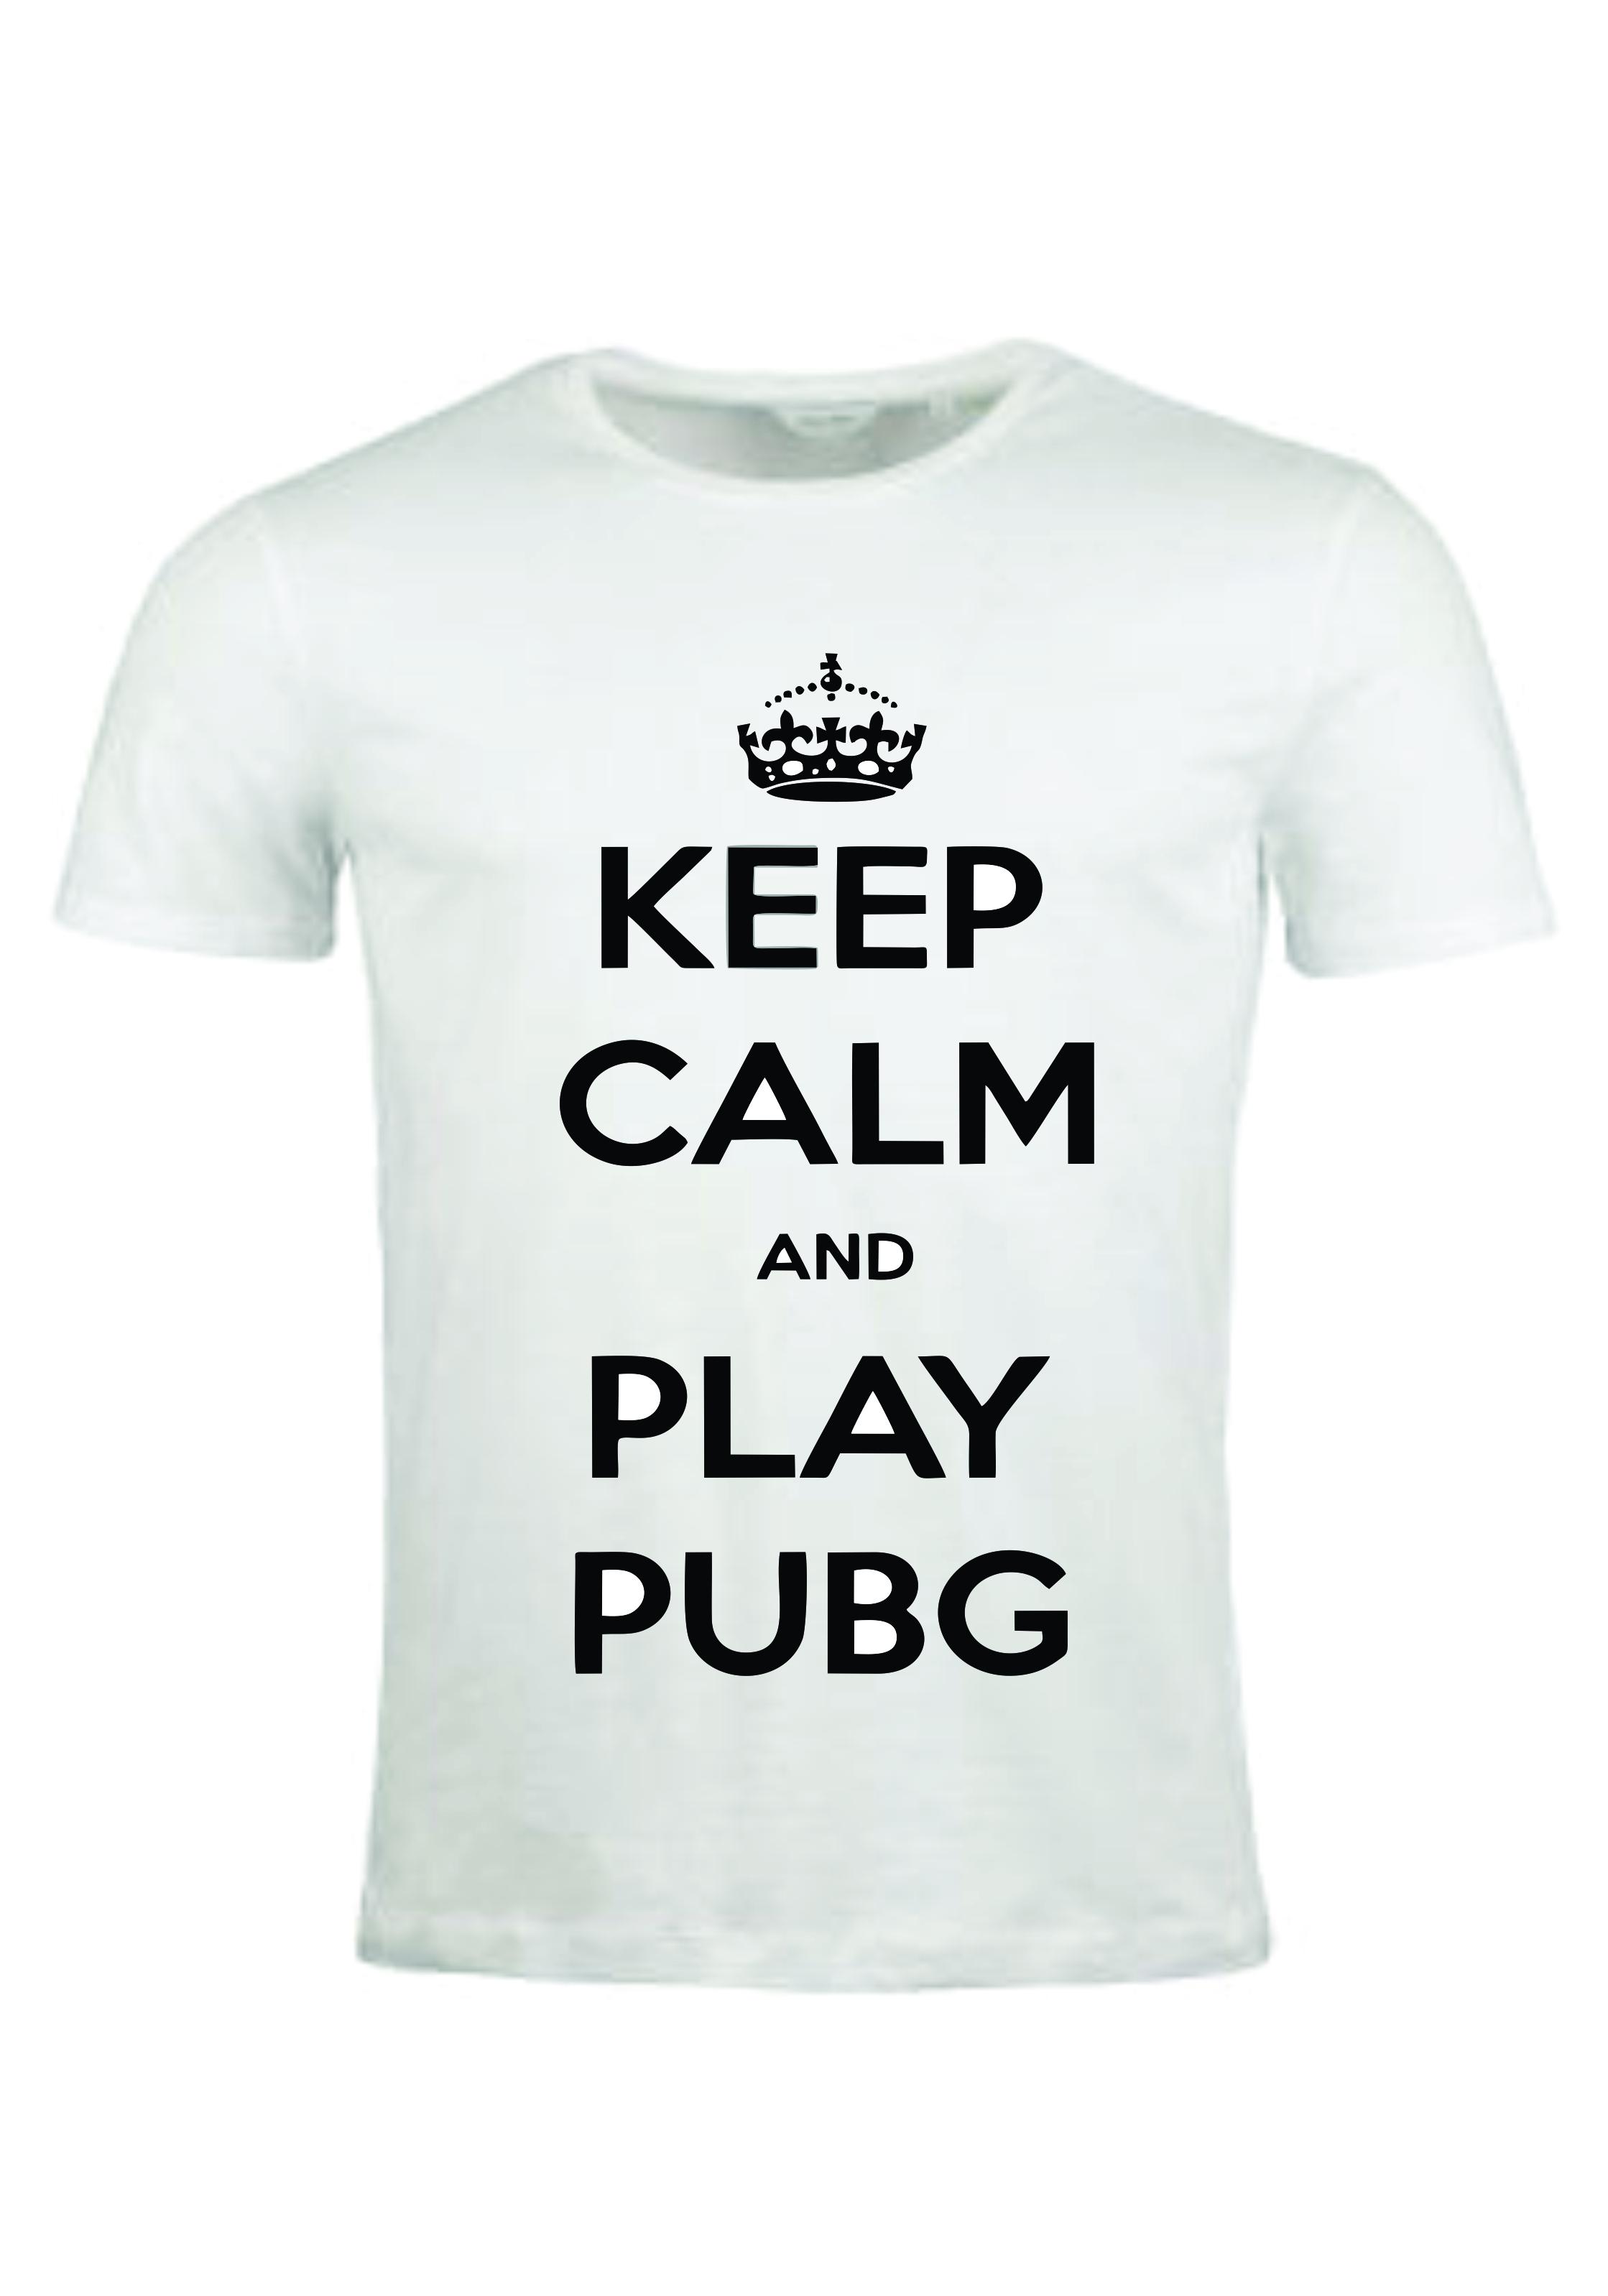 PUBG customized T-shirt